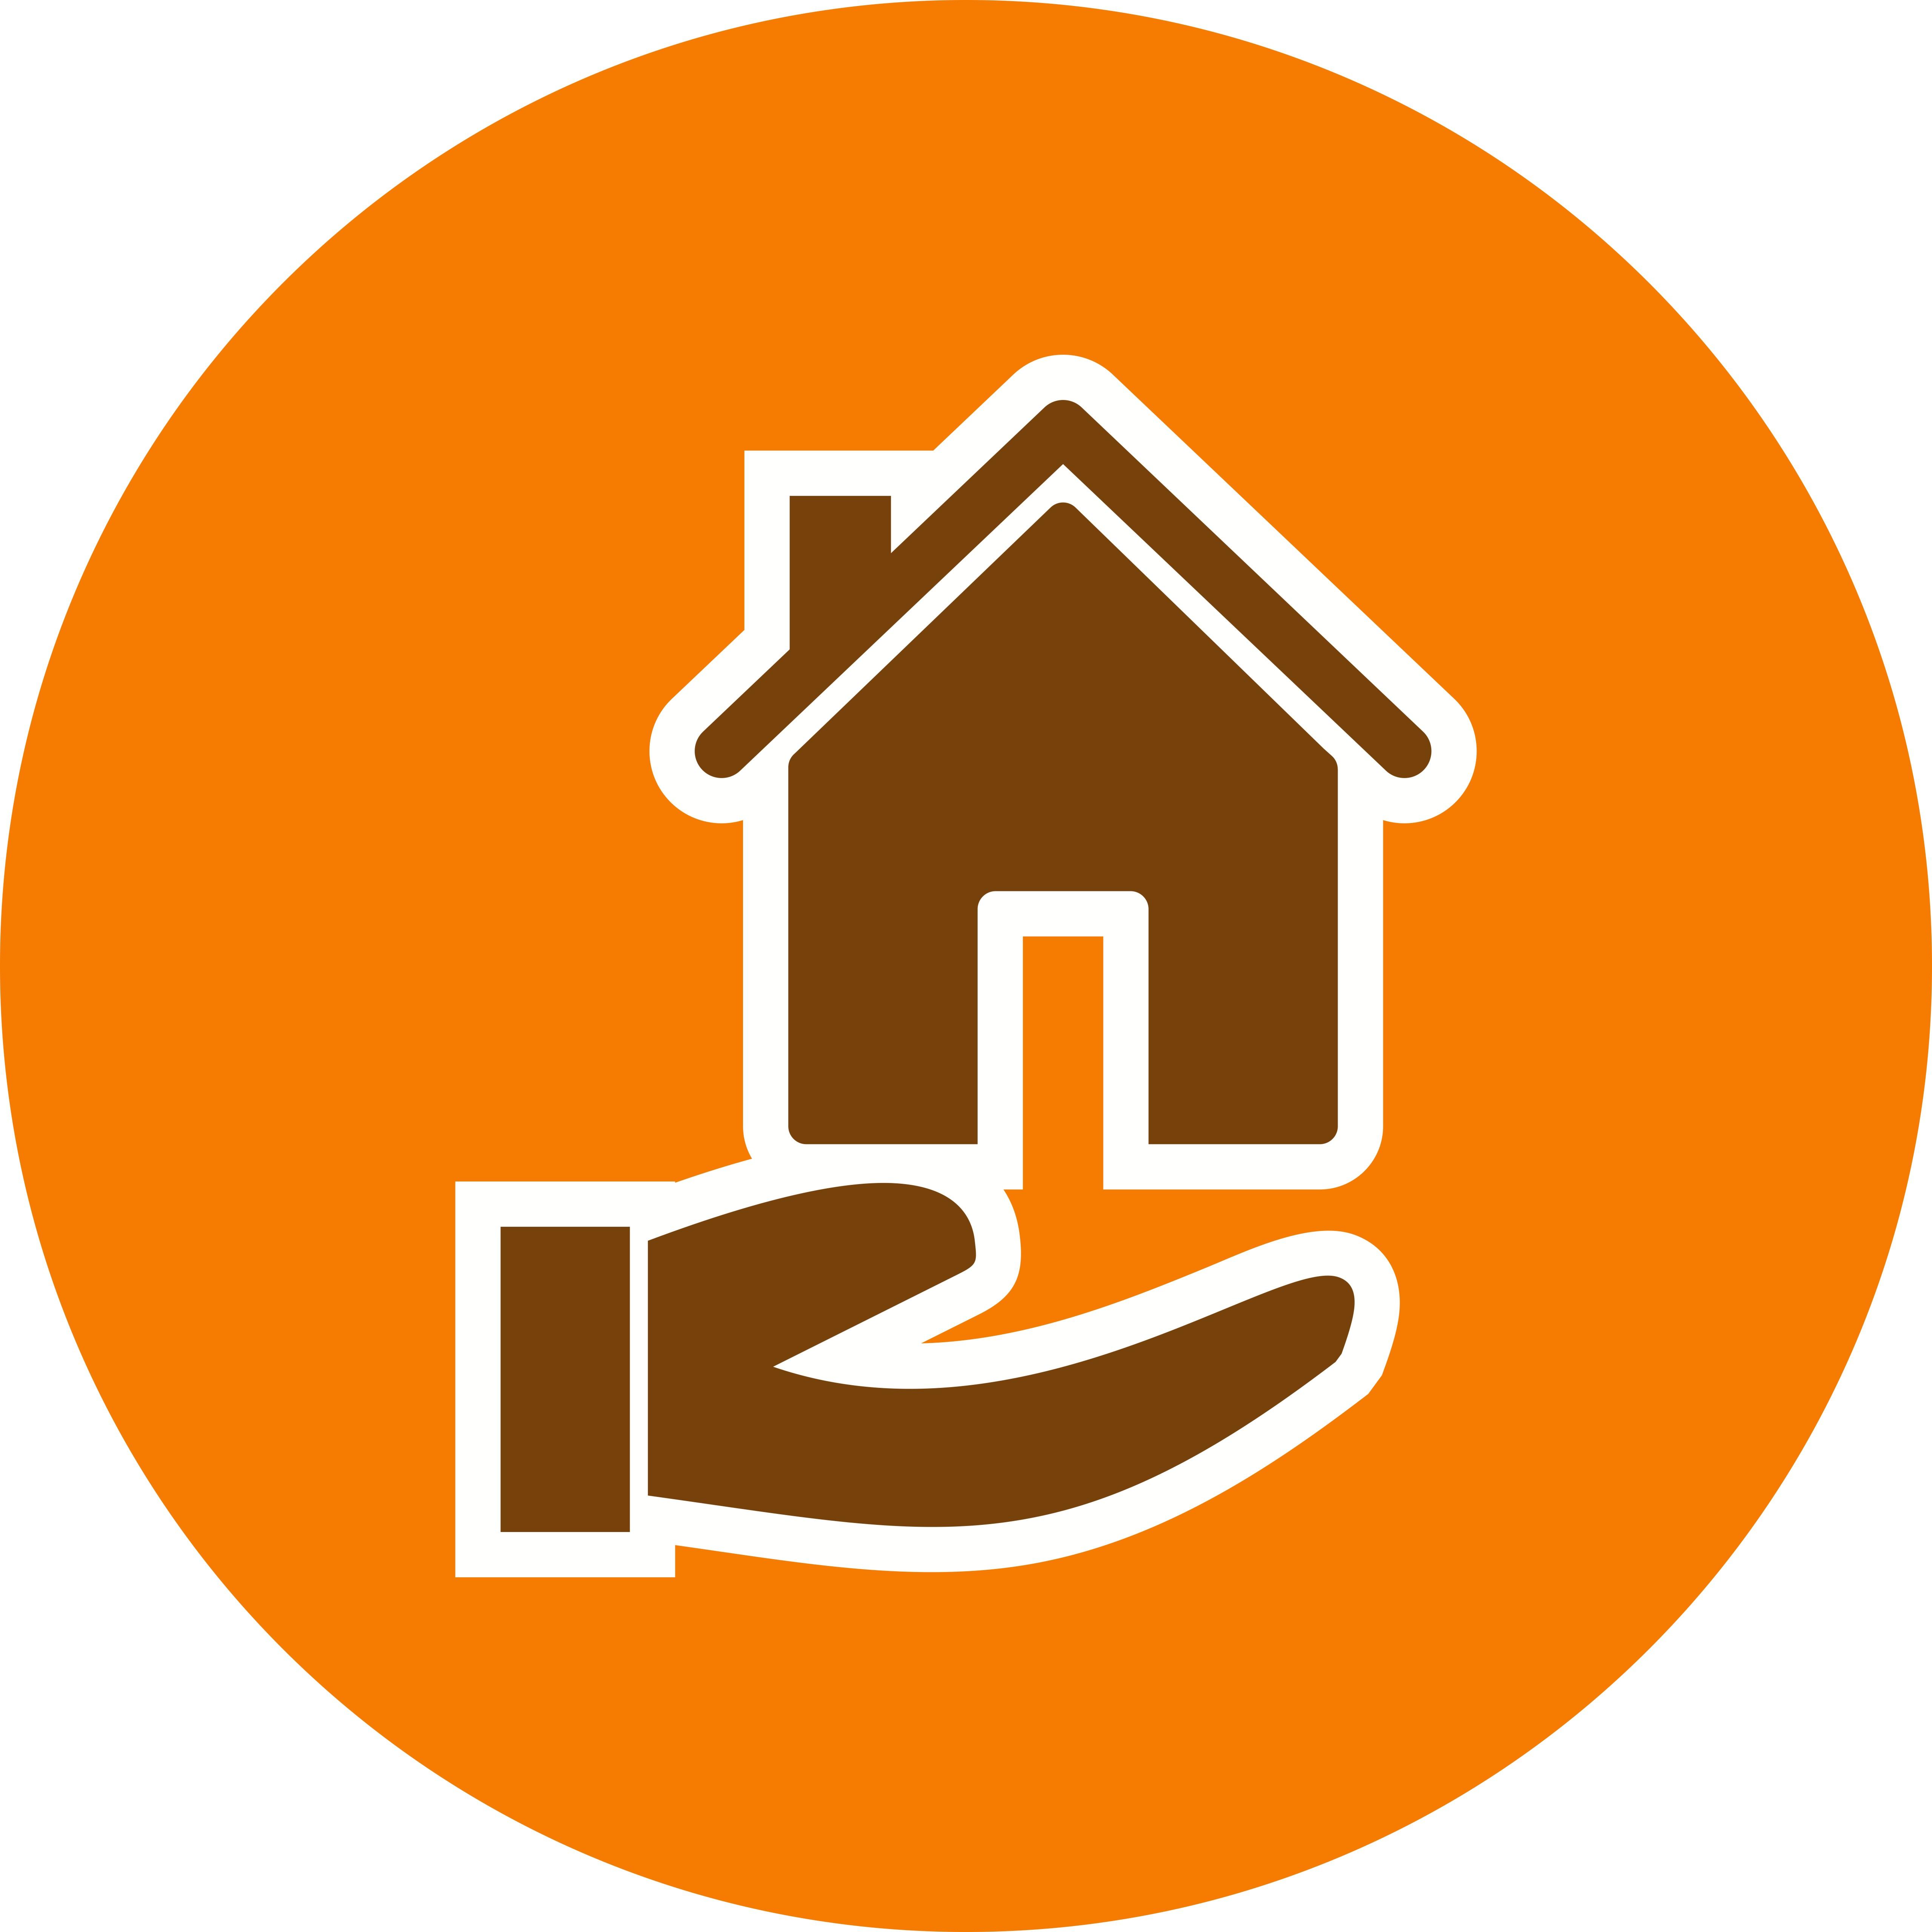 Mortgage Vector Icon - Download Free Vectors, Clipart ...